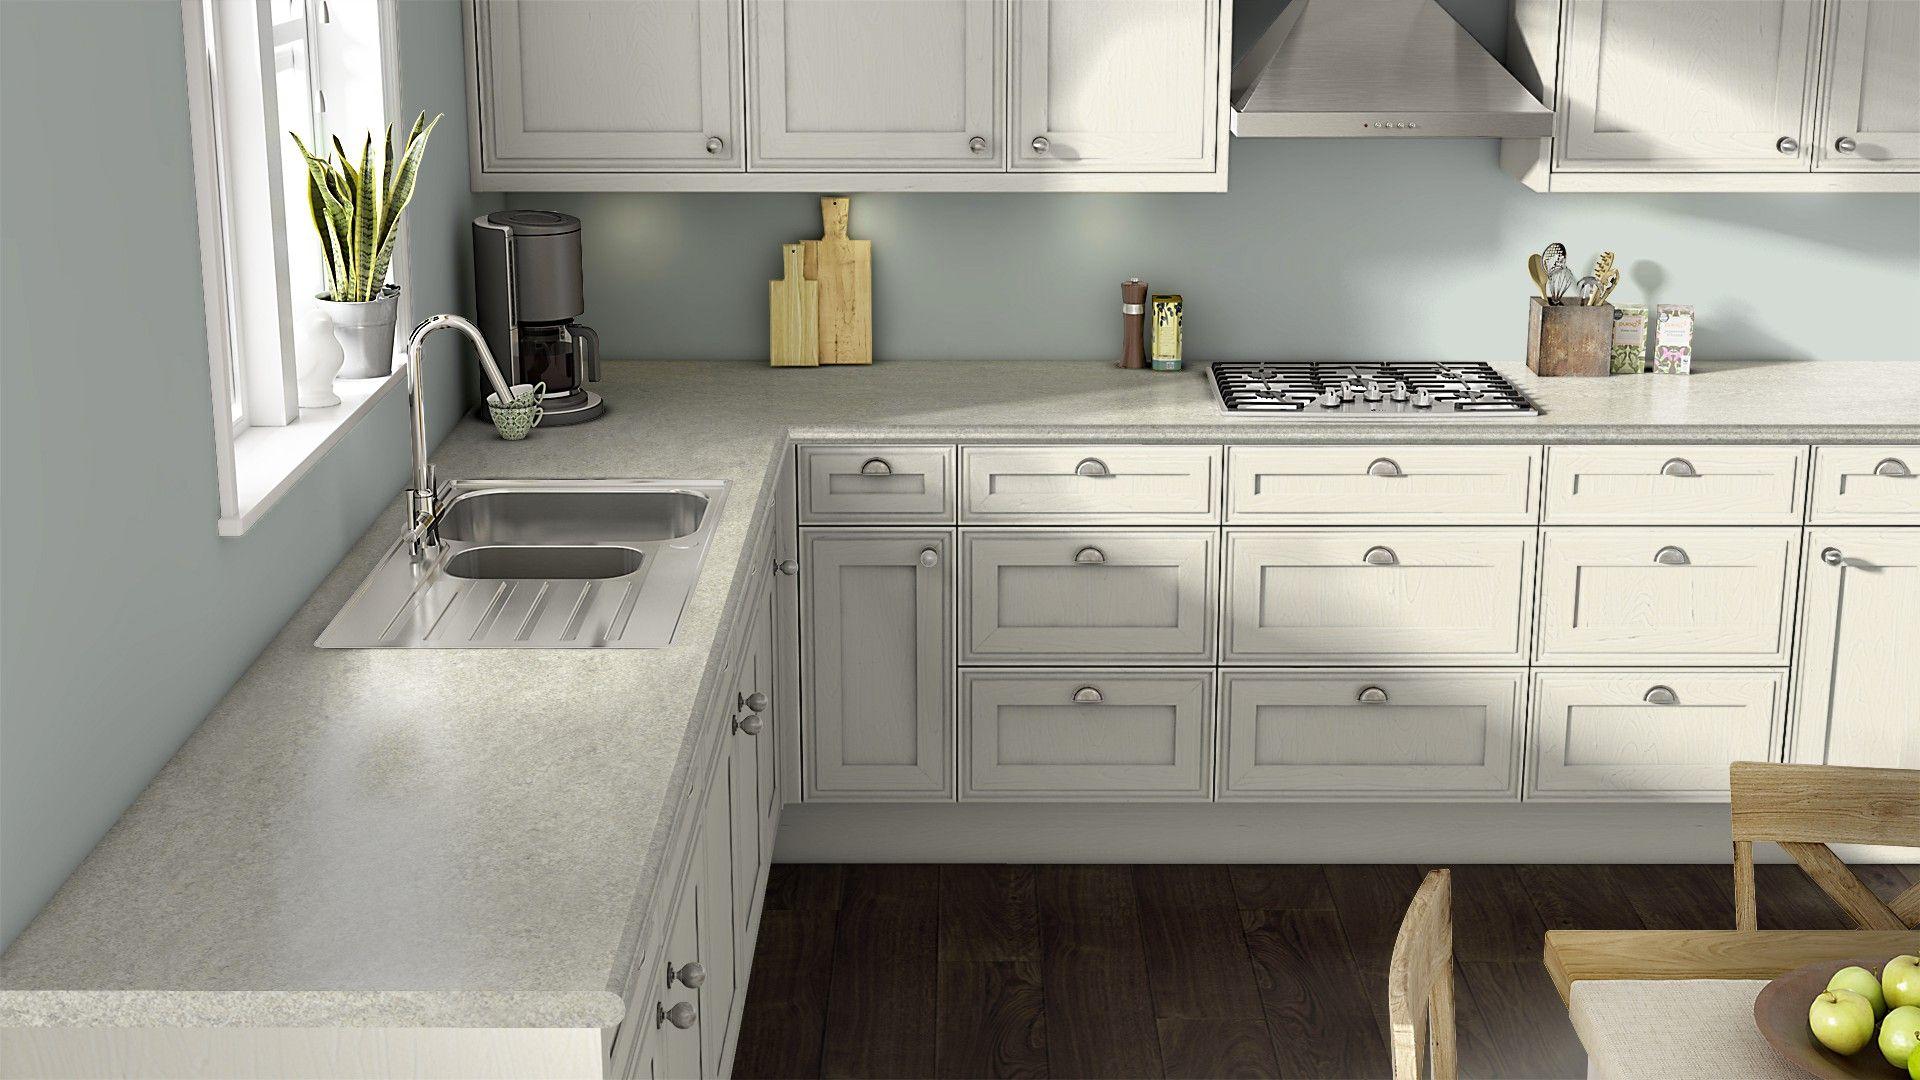 wilsonart s bainebrook grey laminate houseboat kitchen kitchen rh pinterest com au